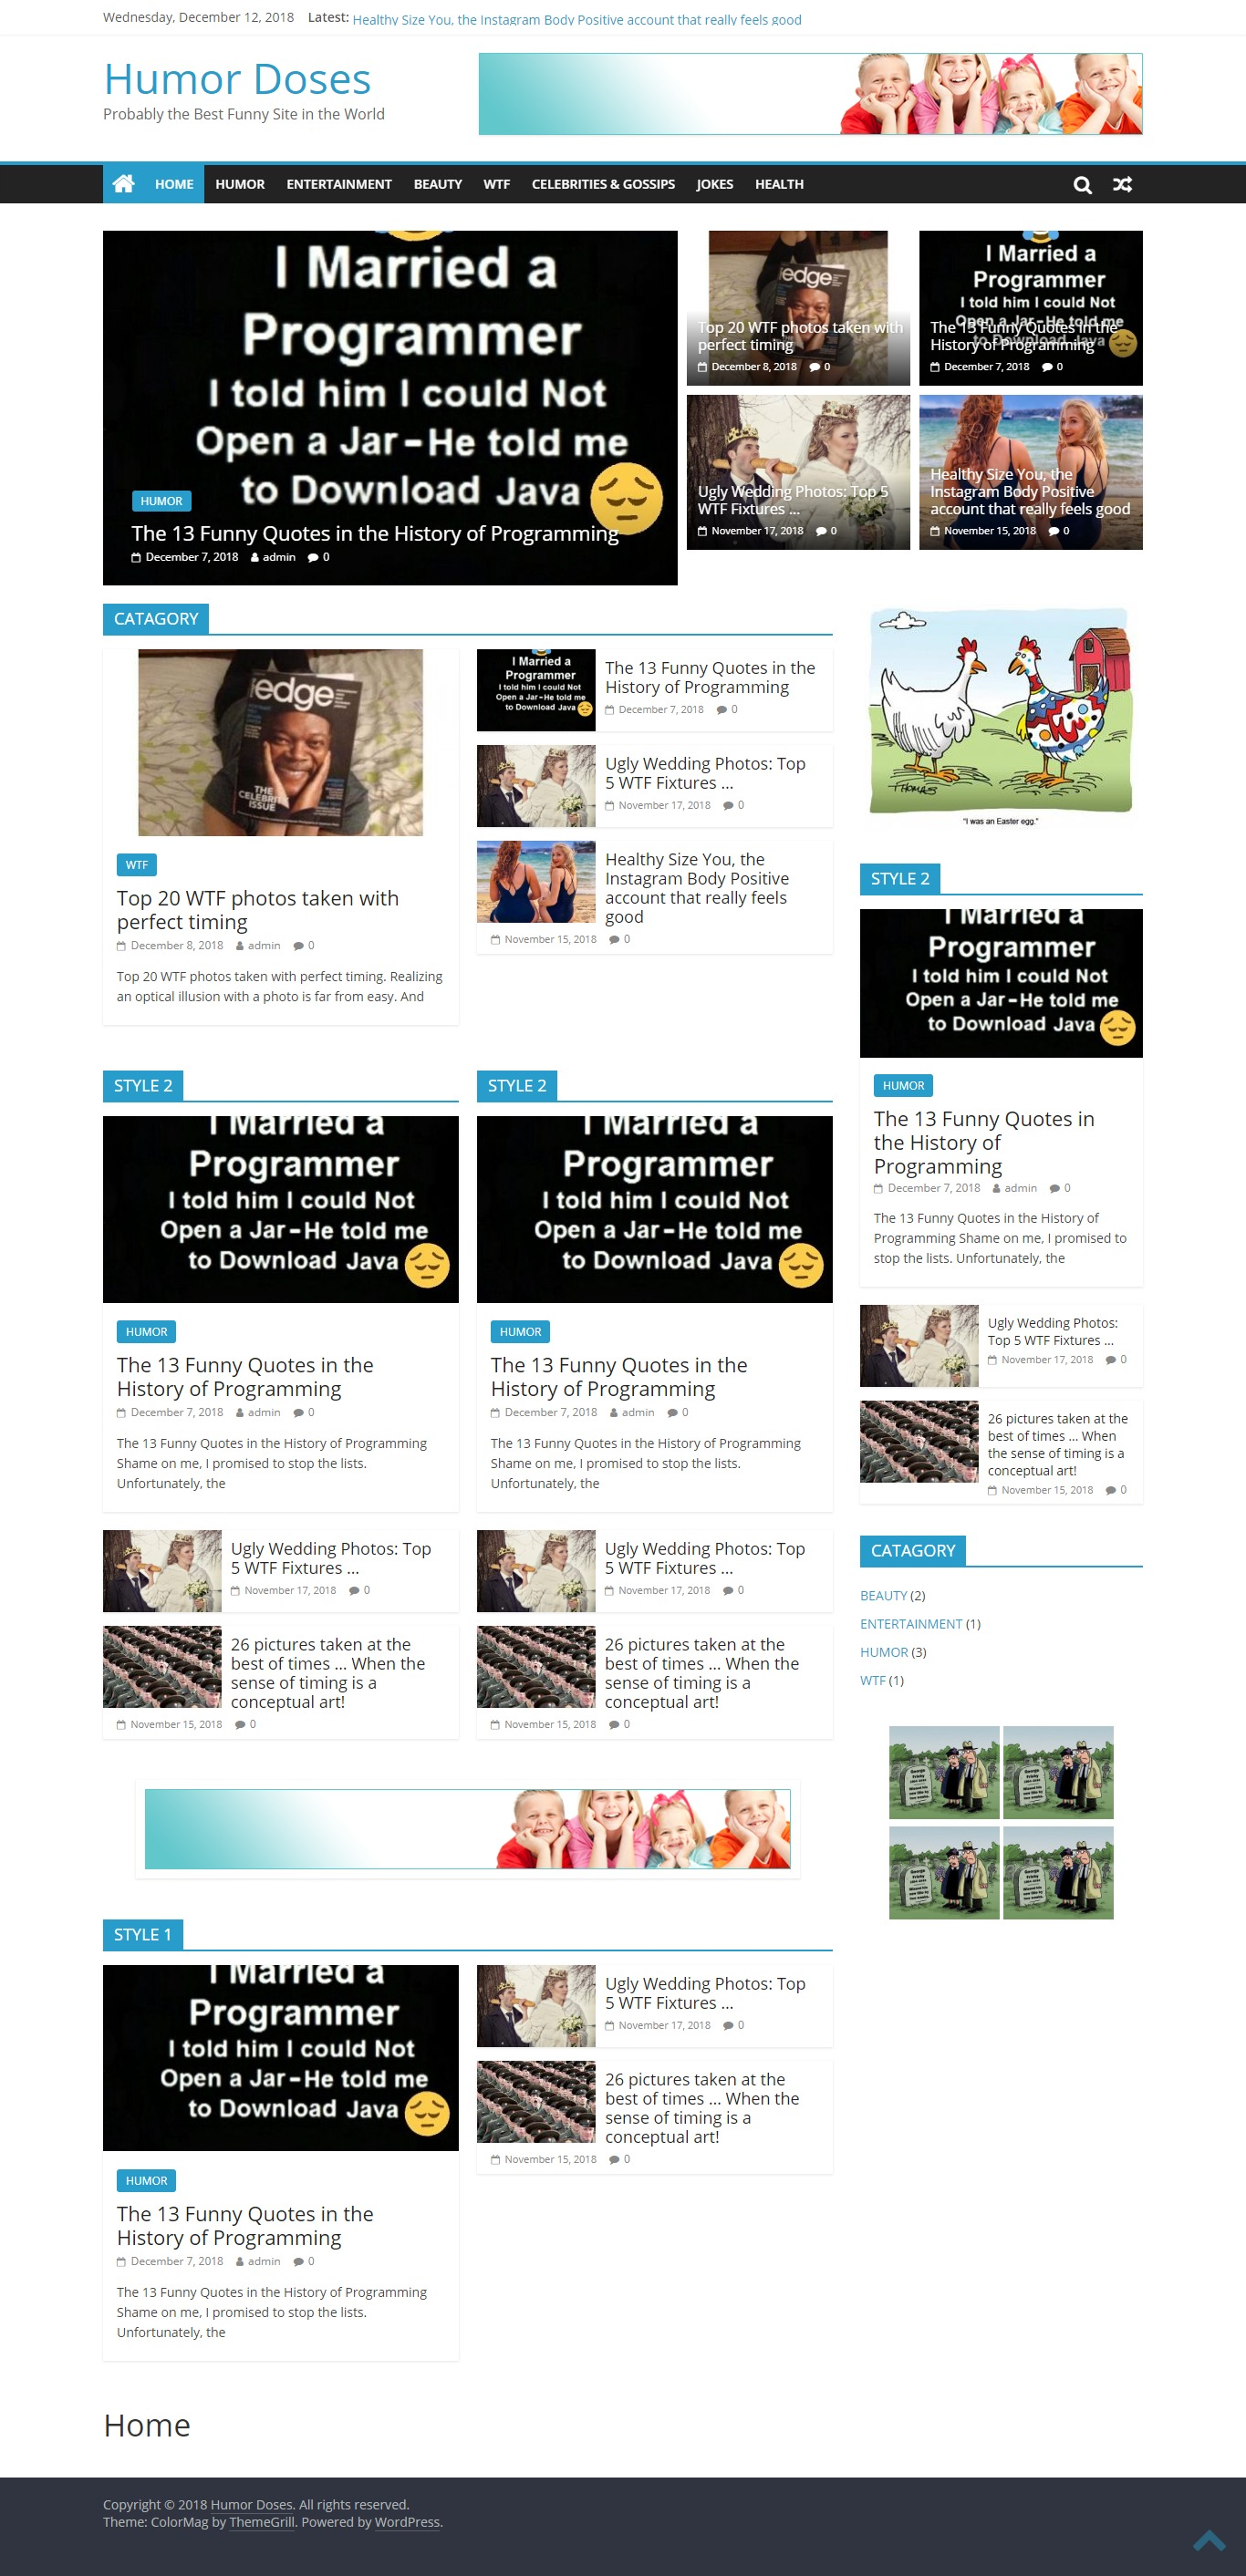 humordoses.com